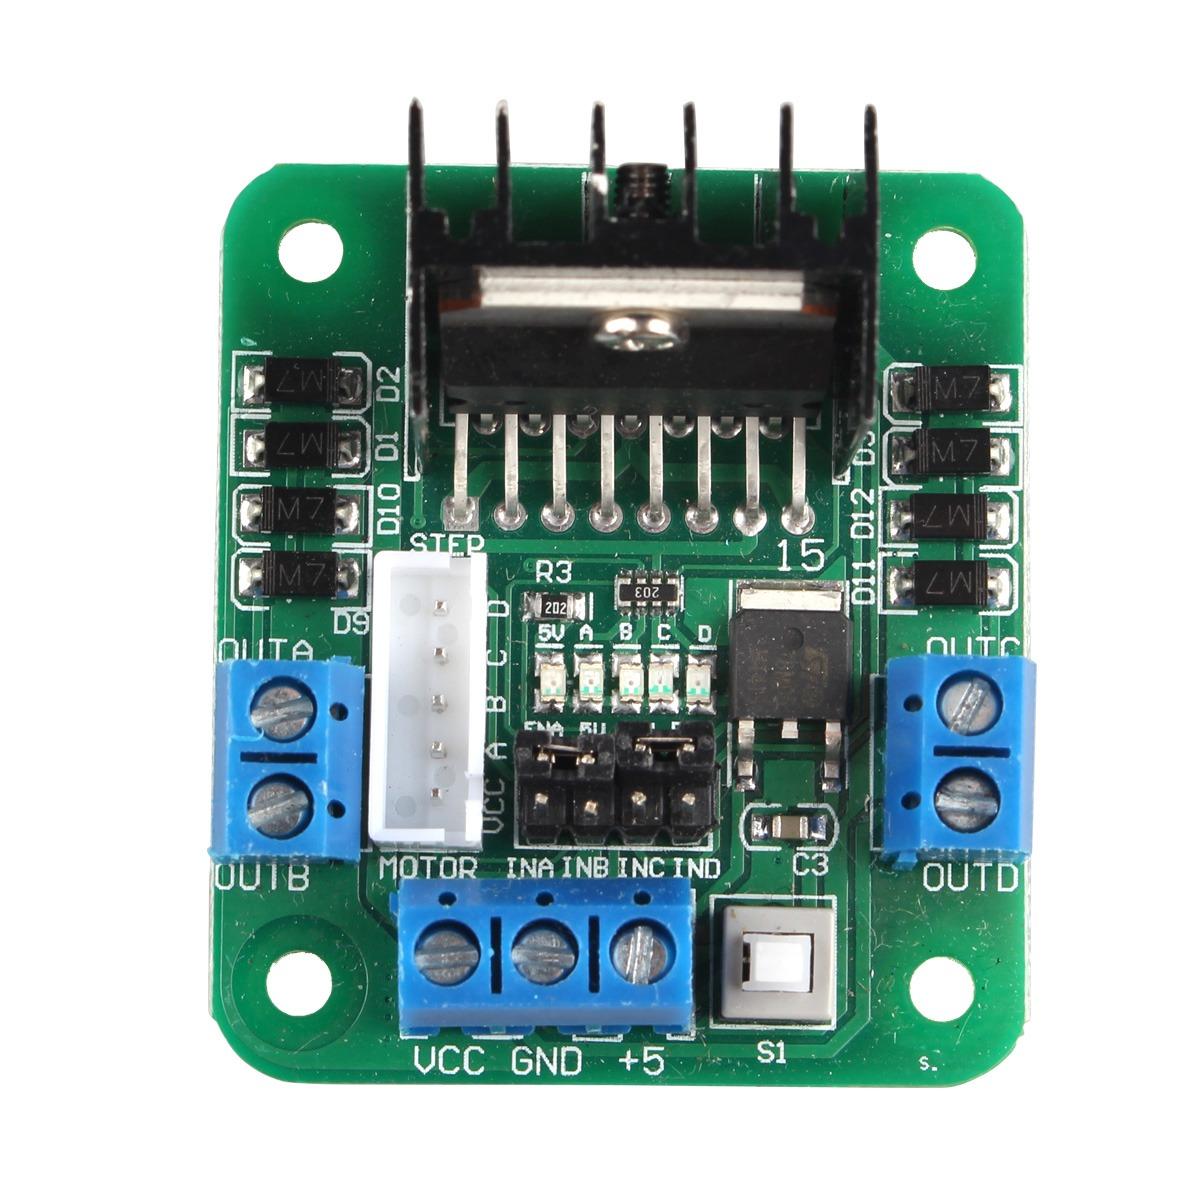 L298n Dual H Bridge Dc Stepper Motor Controller Board For Ar on